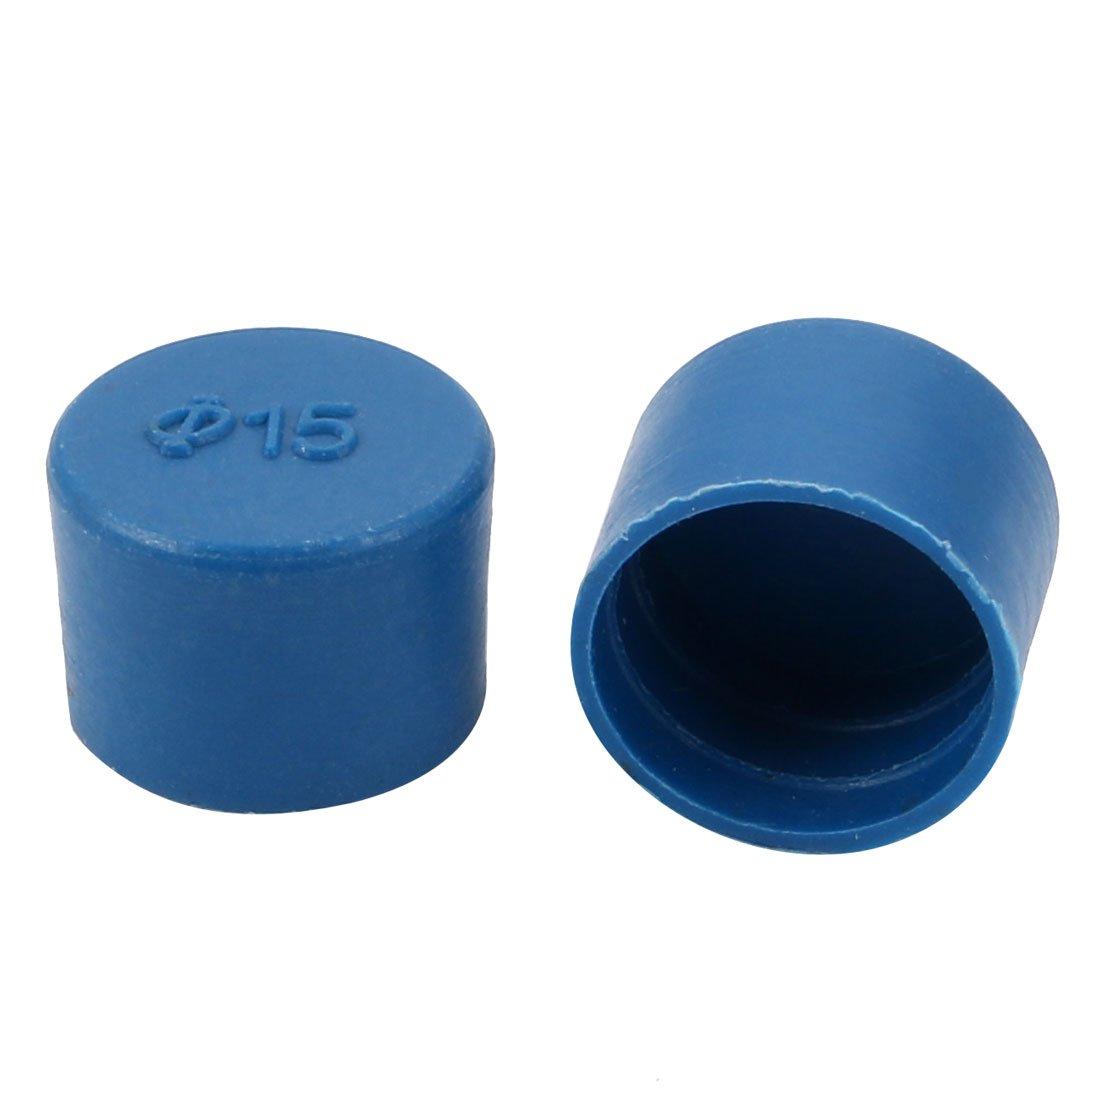 uxcell 2pcs 15mm Inner Dia PE Plastic End Cap Bolt Thread Protector Tube Cover Blue